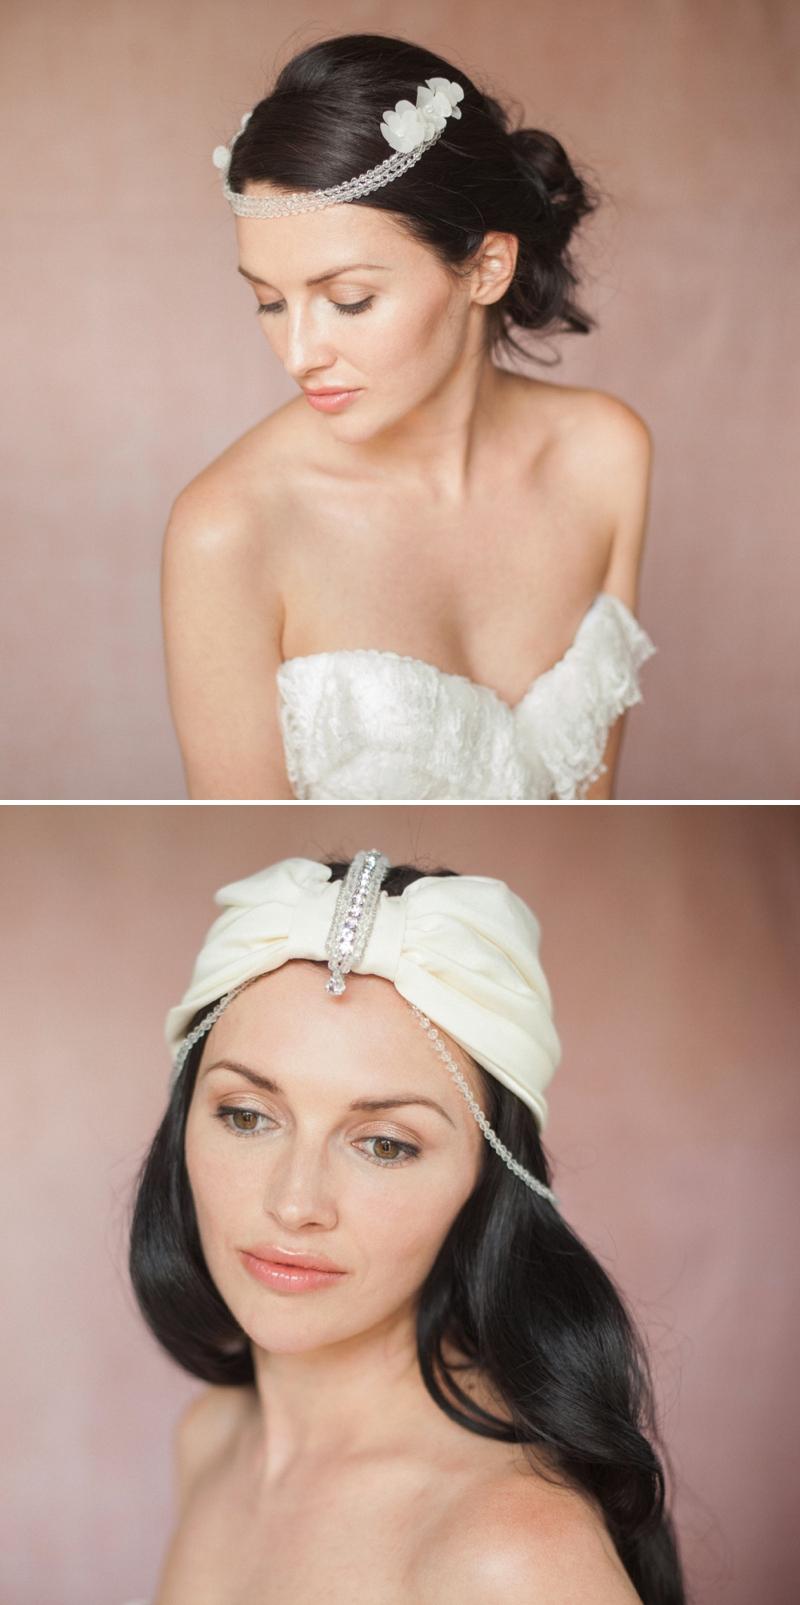 Britten 2014 Liberte Collection vintage inspired bridal wedding accessories headpieces_0156